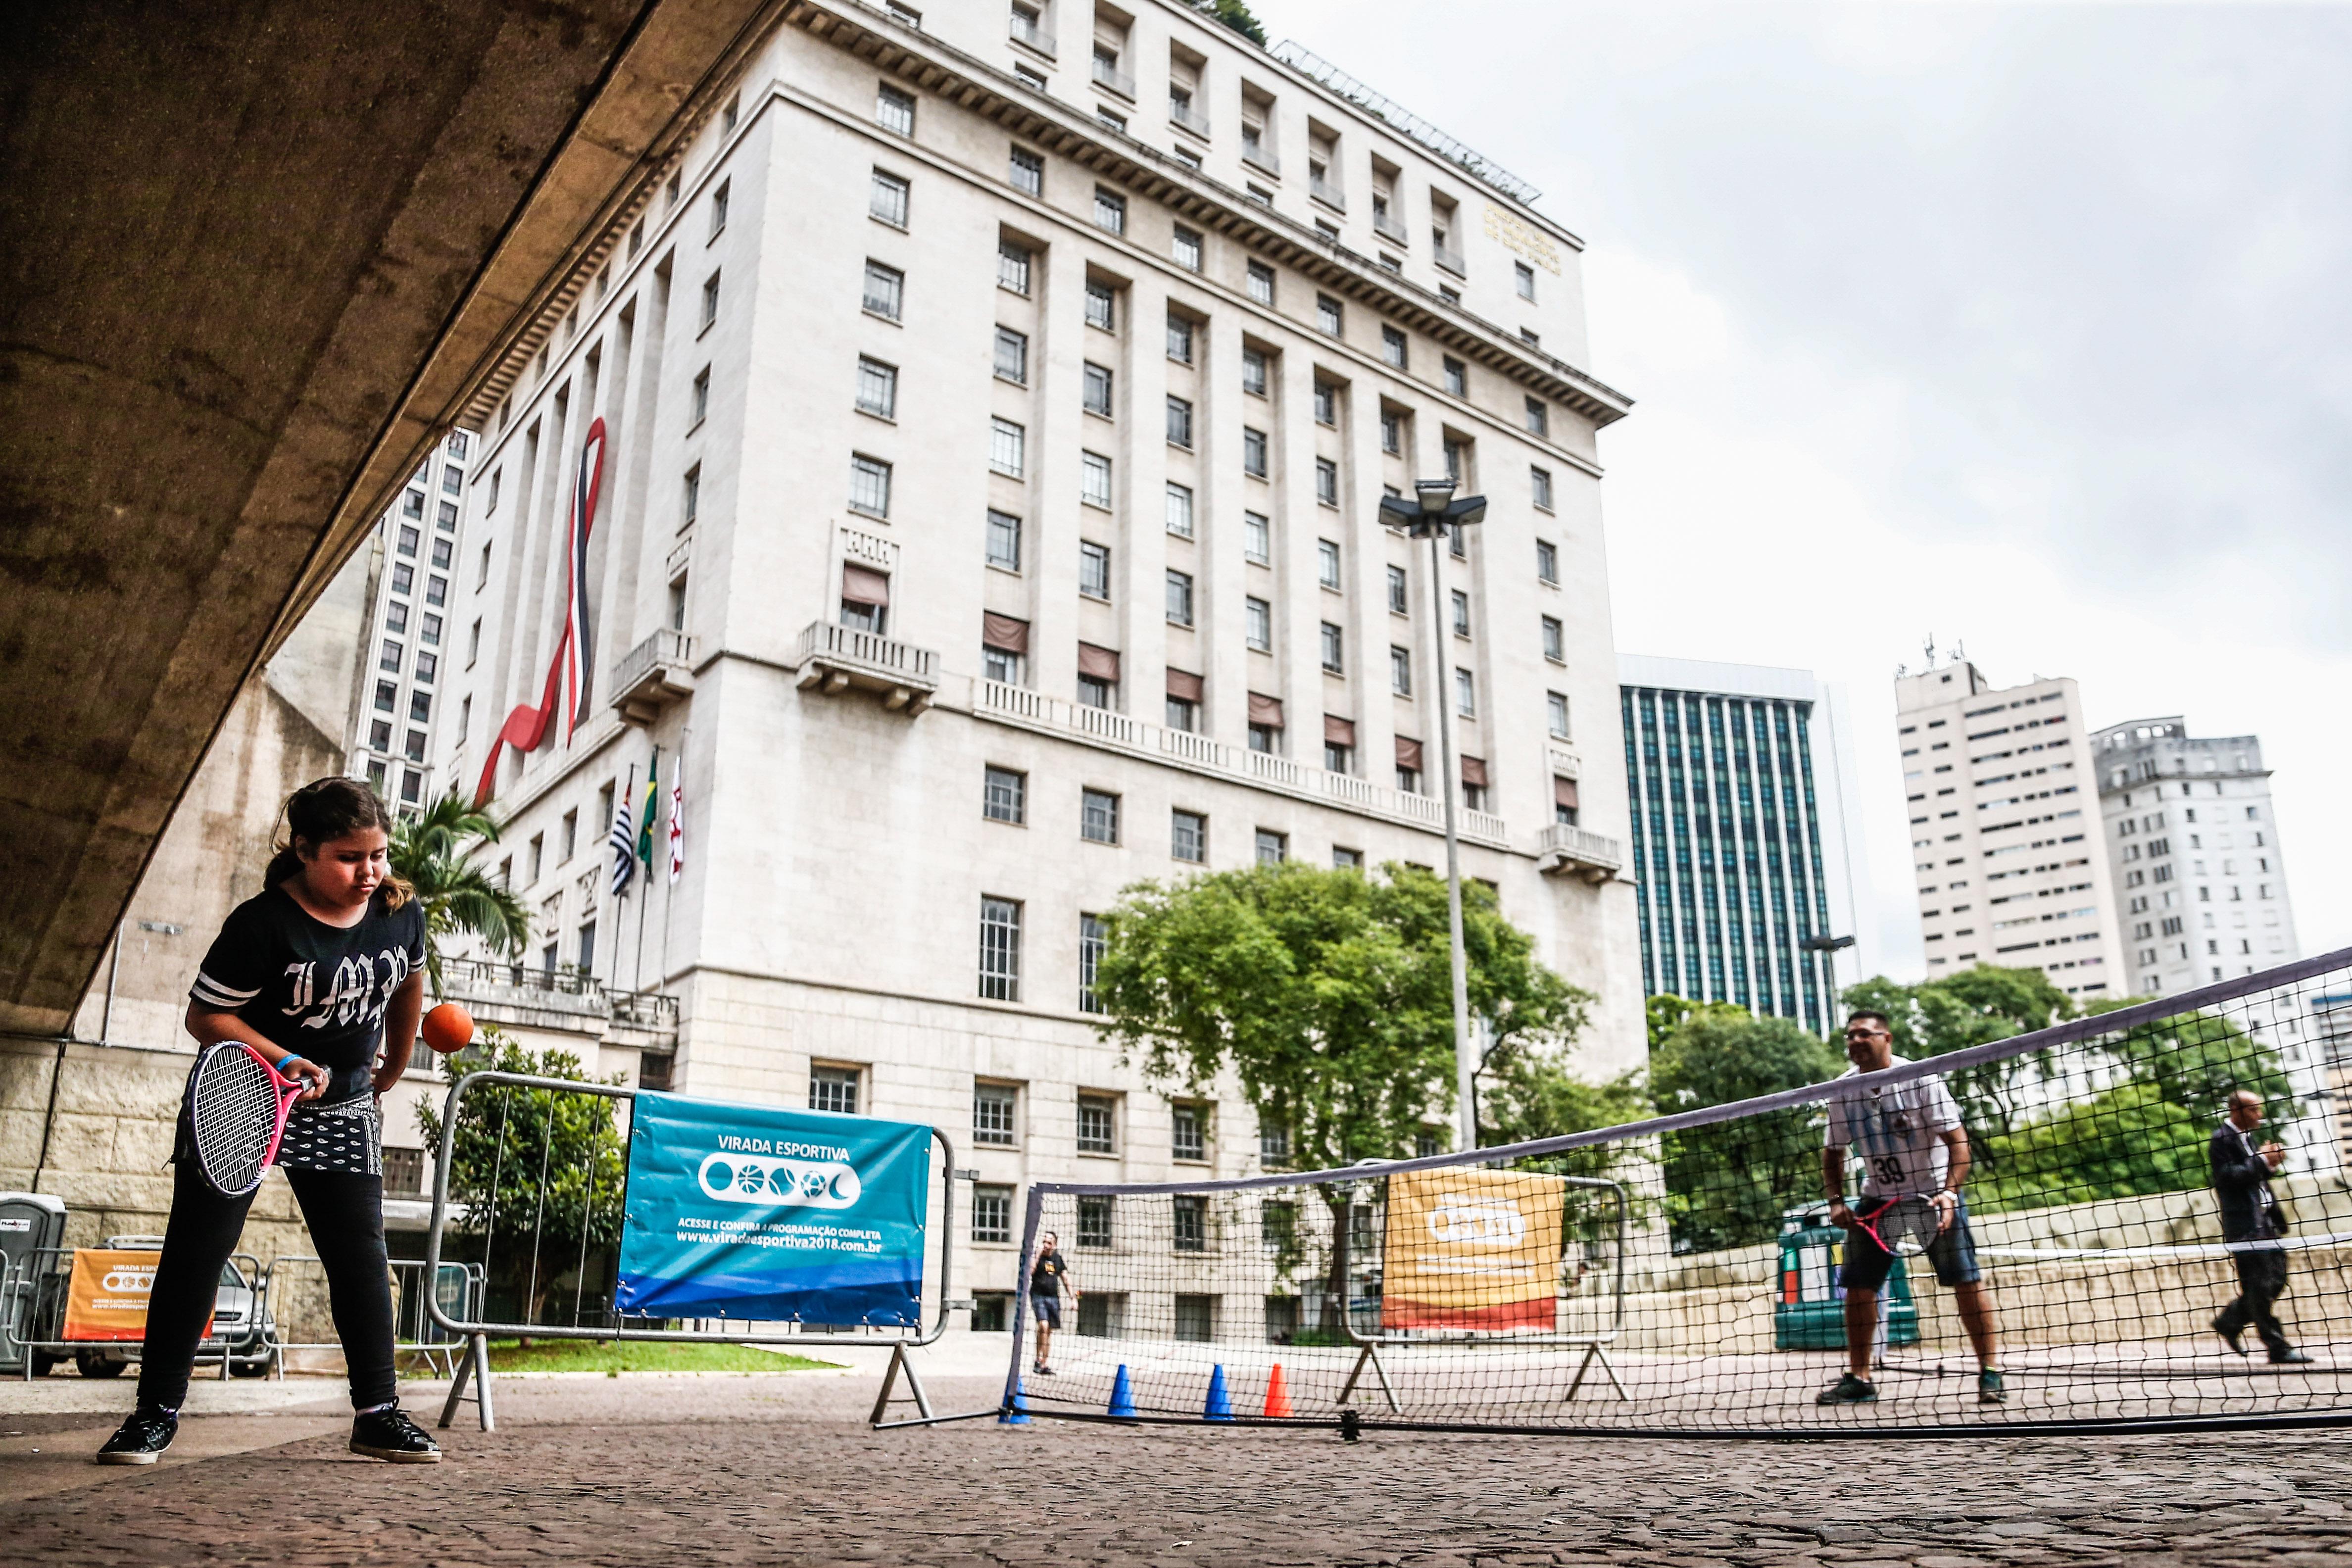 Virada Esportiva 2018 - Anhangabaú